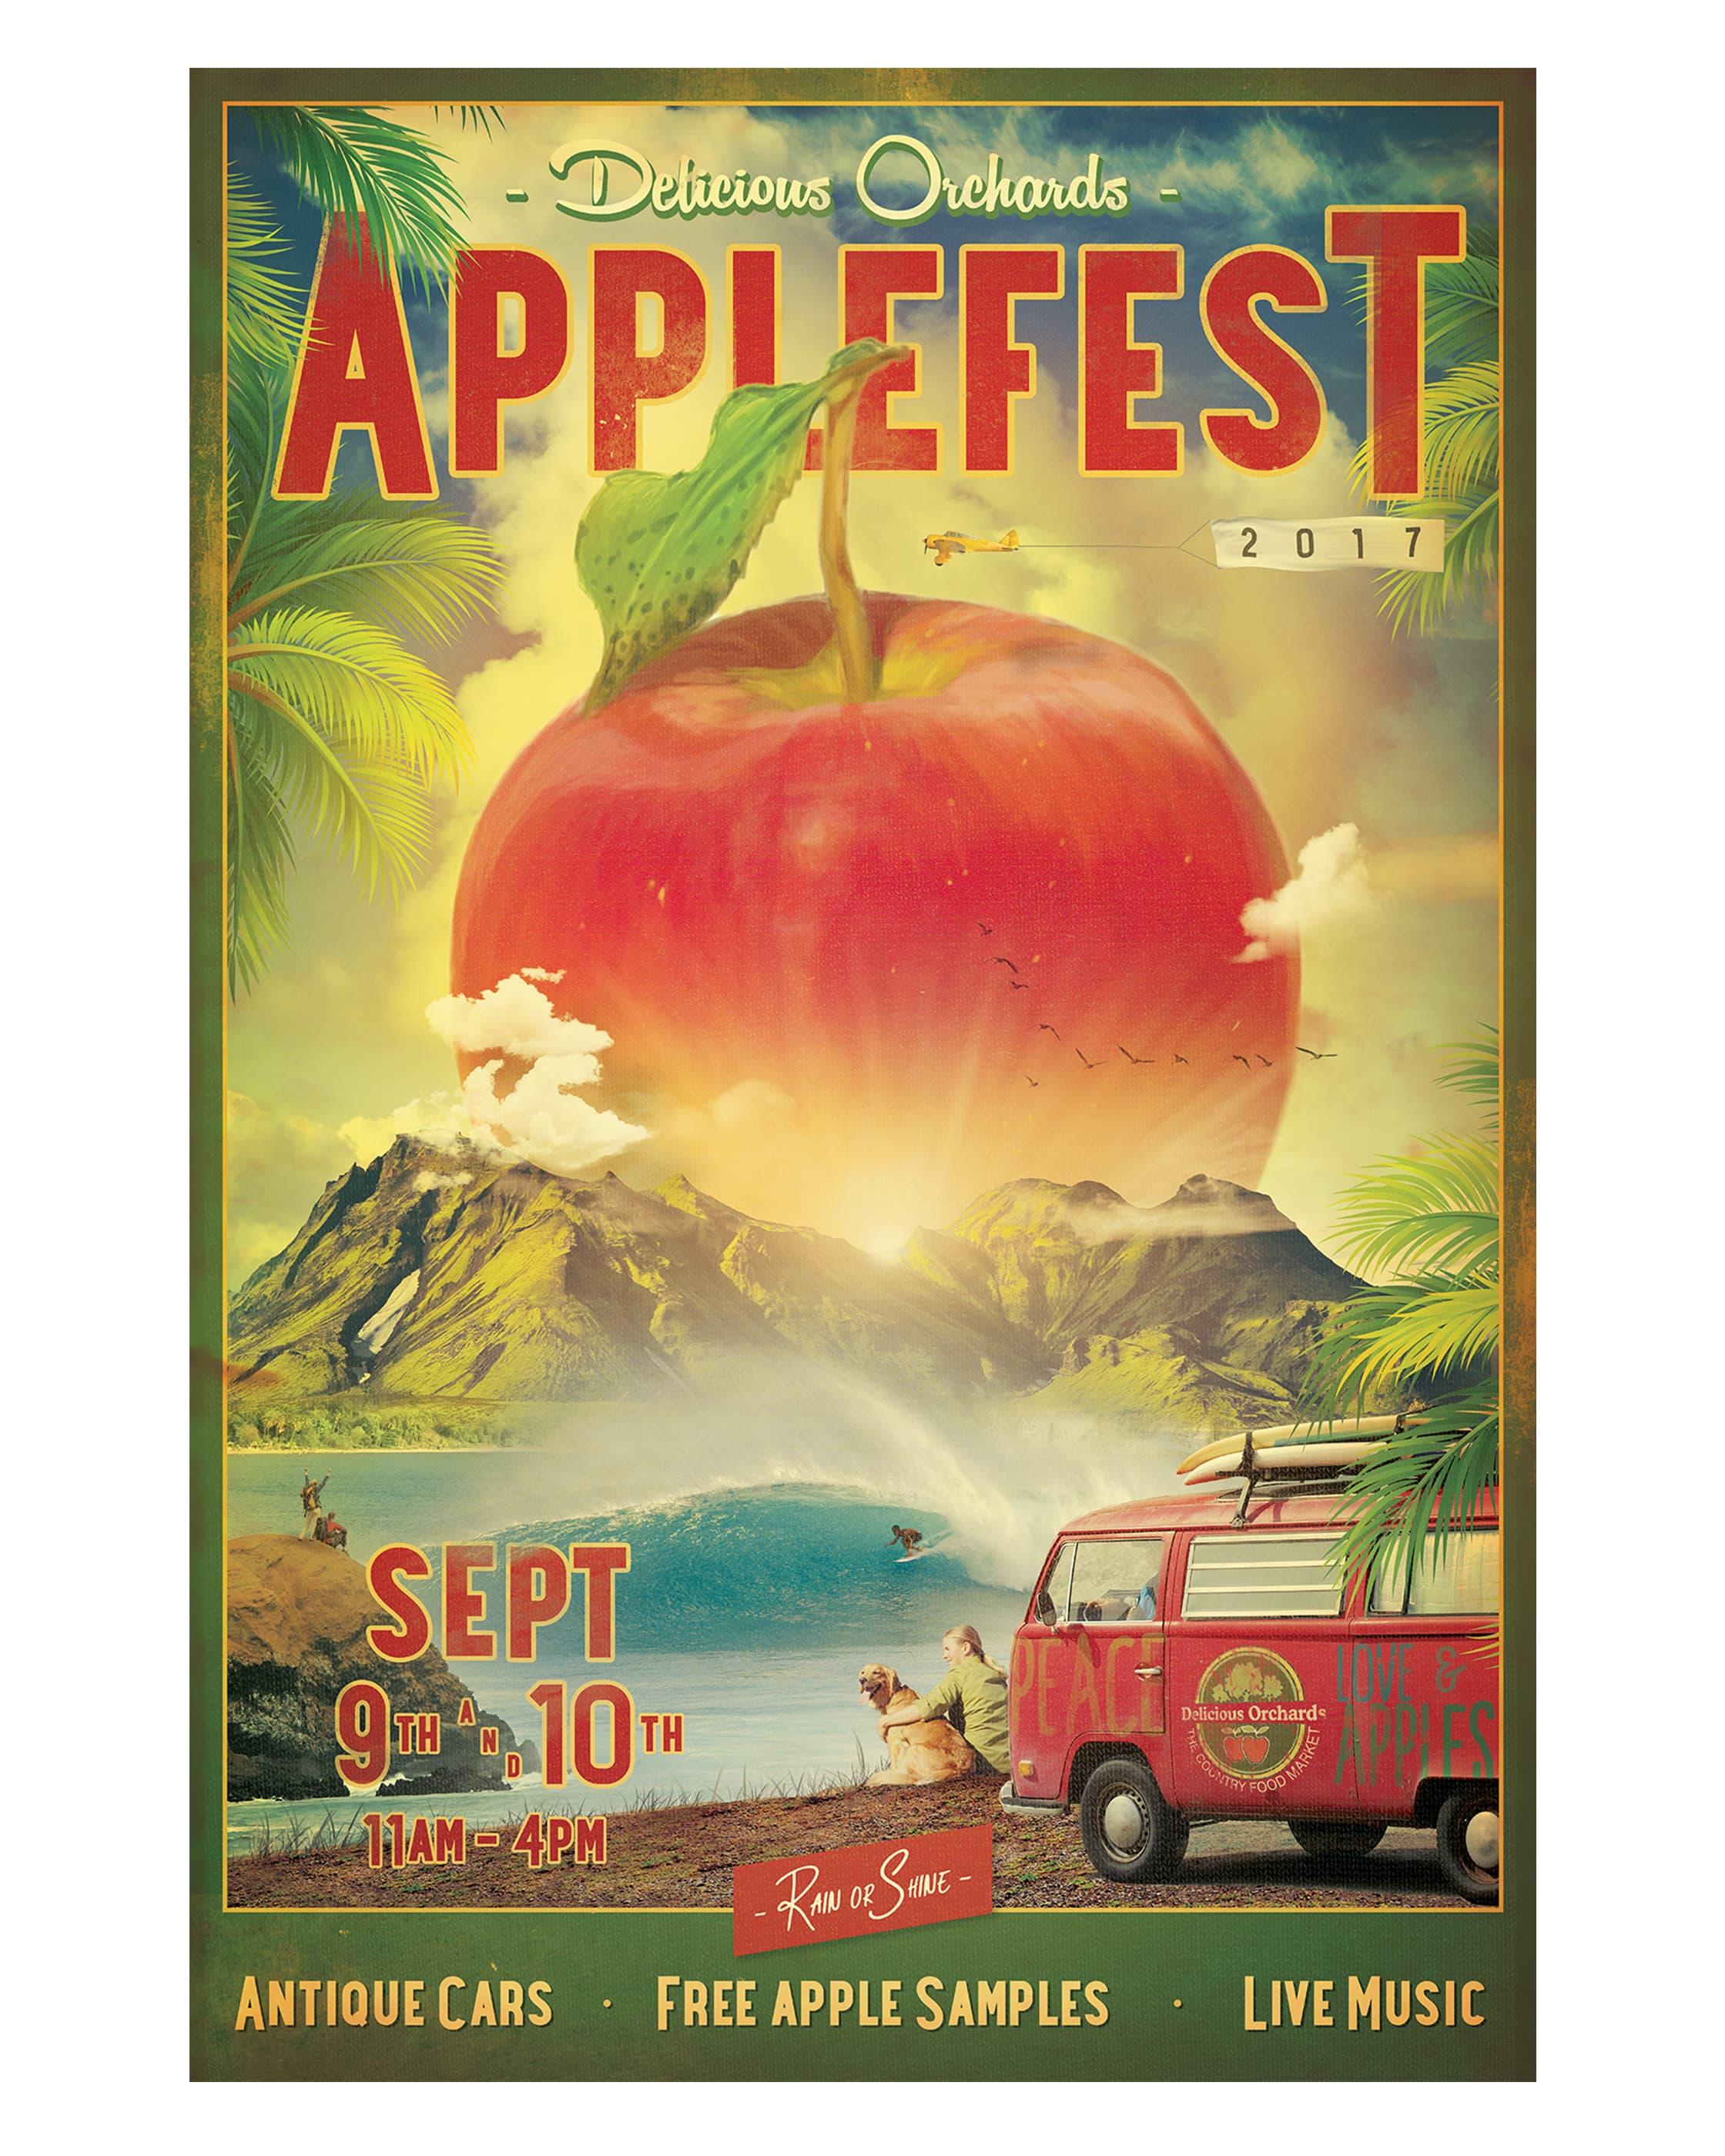 Applefest Poster 2017